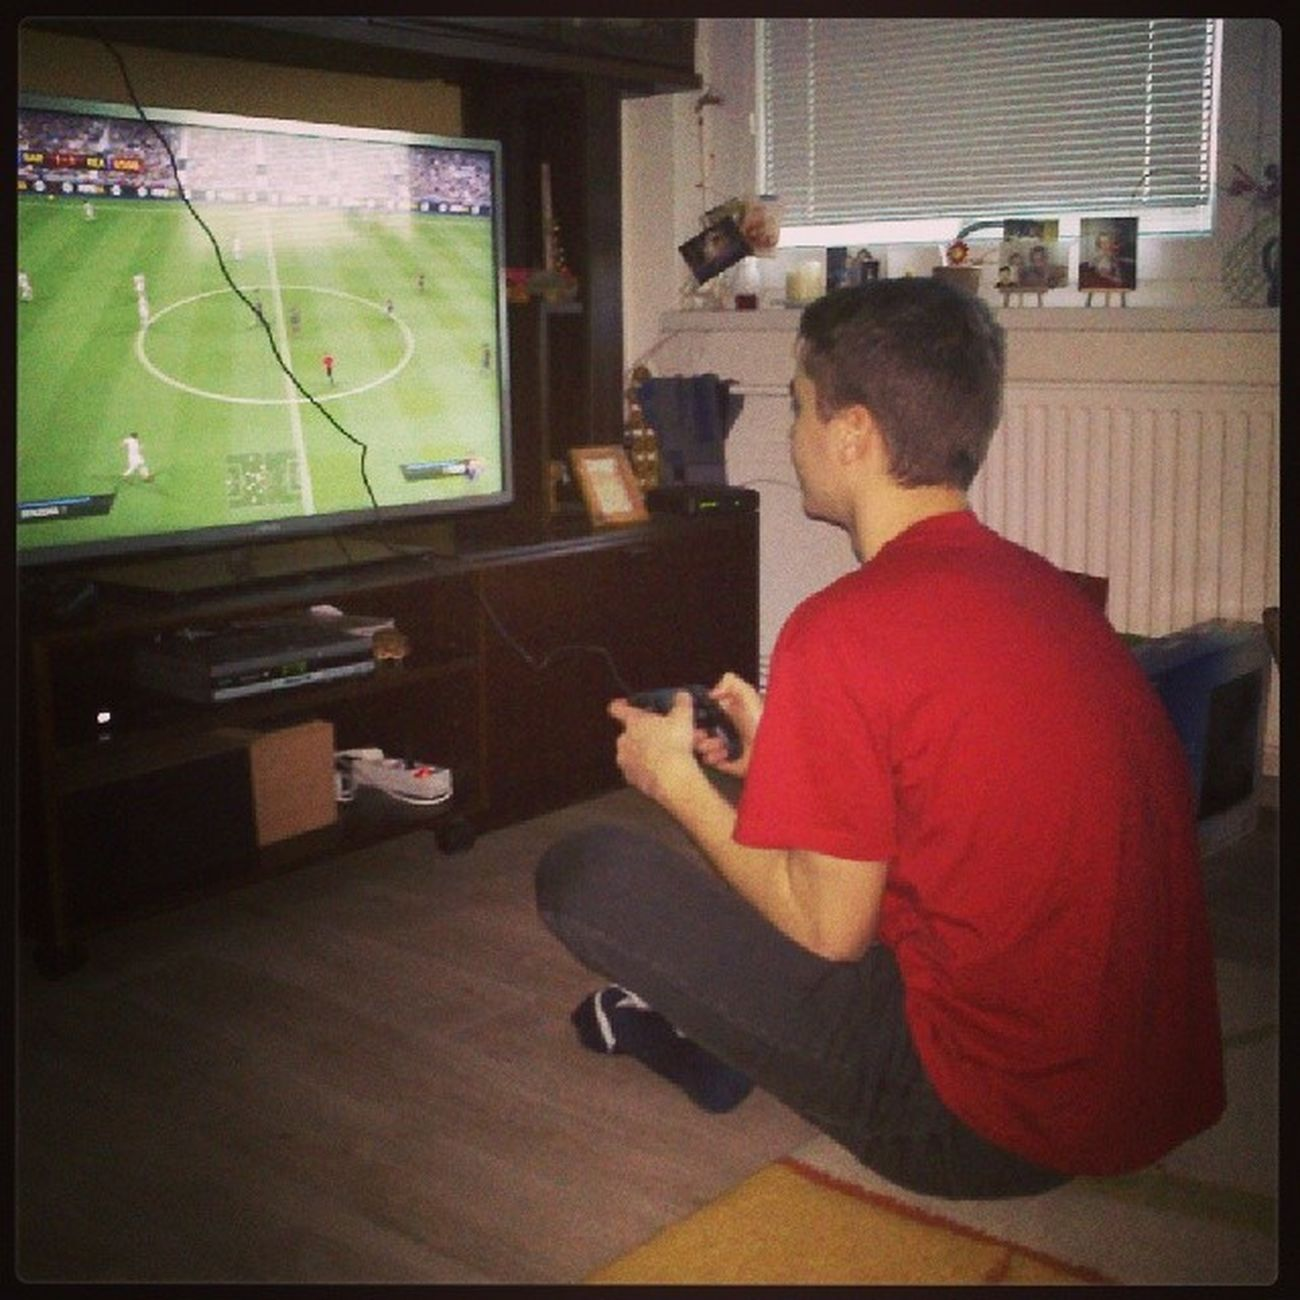 Feťák...... Dává si dávku FIFA 14 Fifa14 Addiction Fotbalekpičo